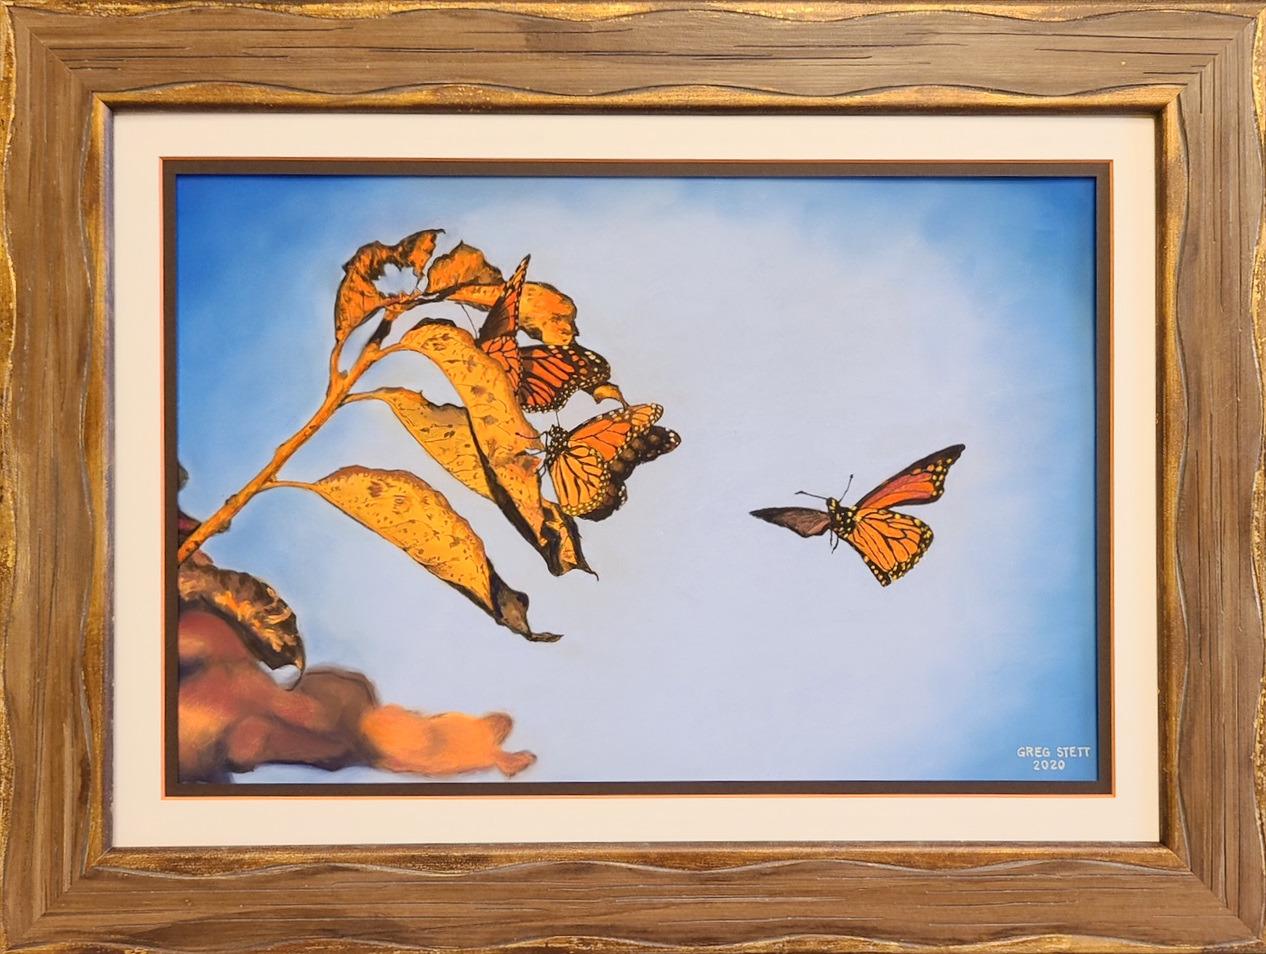 Roosting monarchs2 1 ermazo